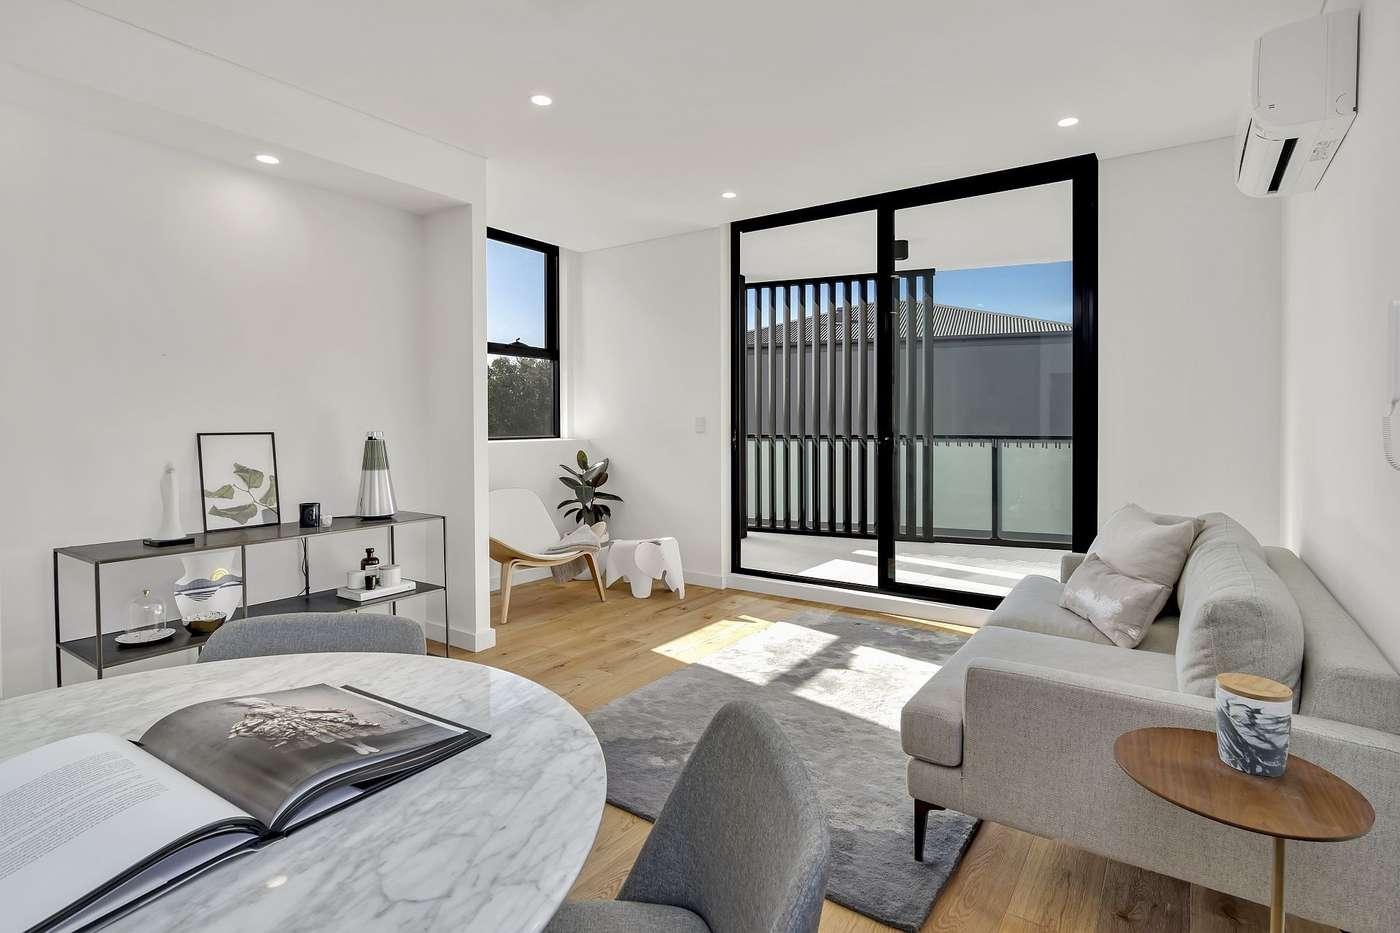 Main view of Homely apartment listing, 309/29-33 Birmingham Street, Alexandria, NSW 2015